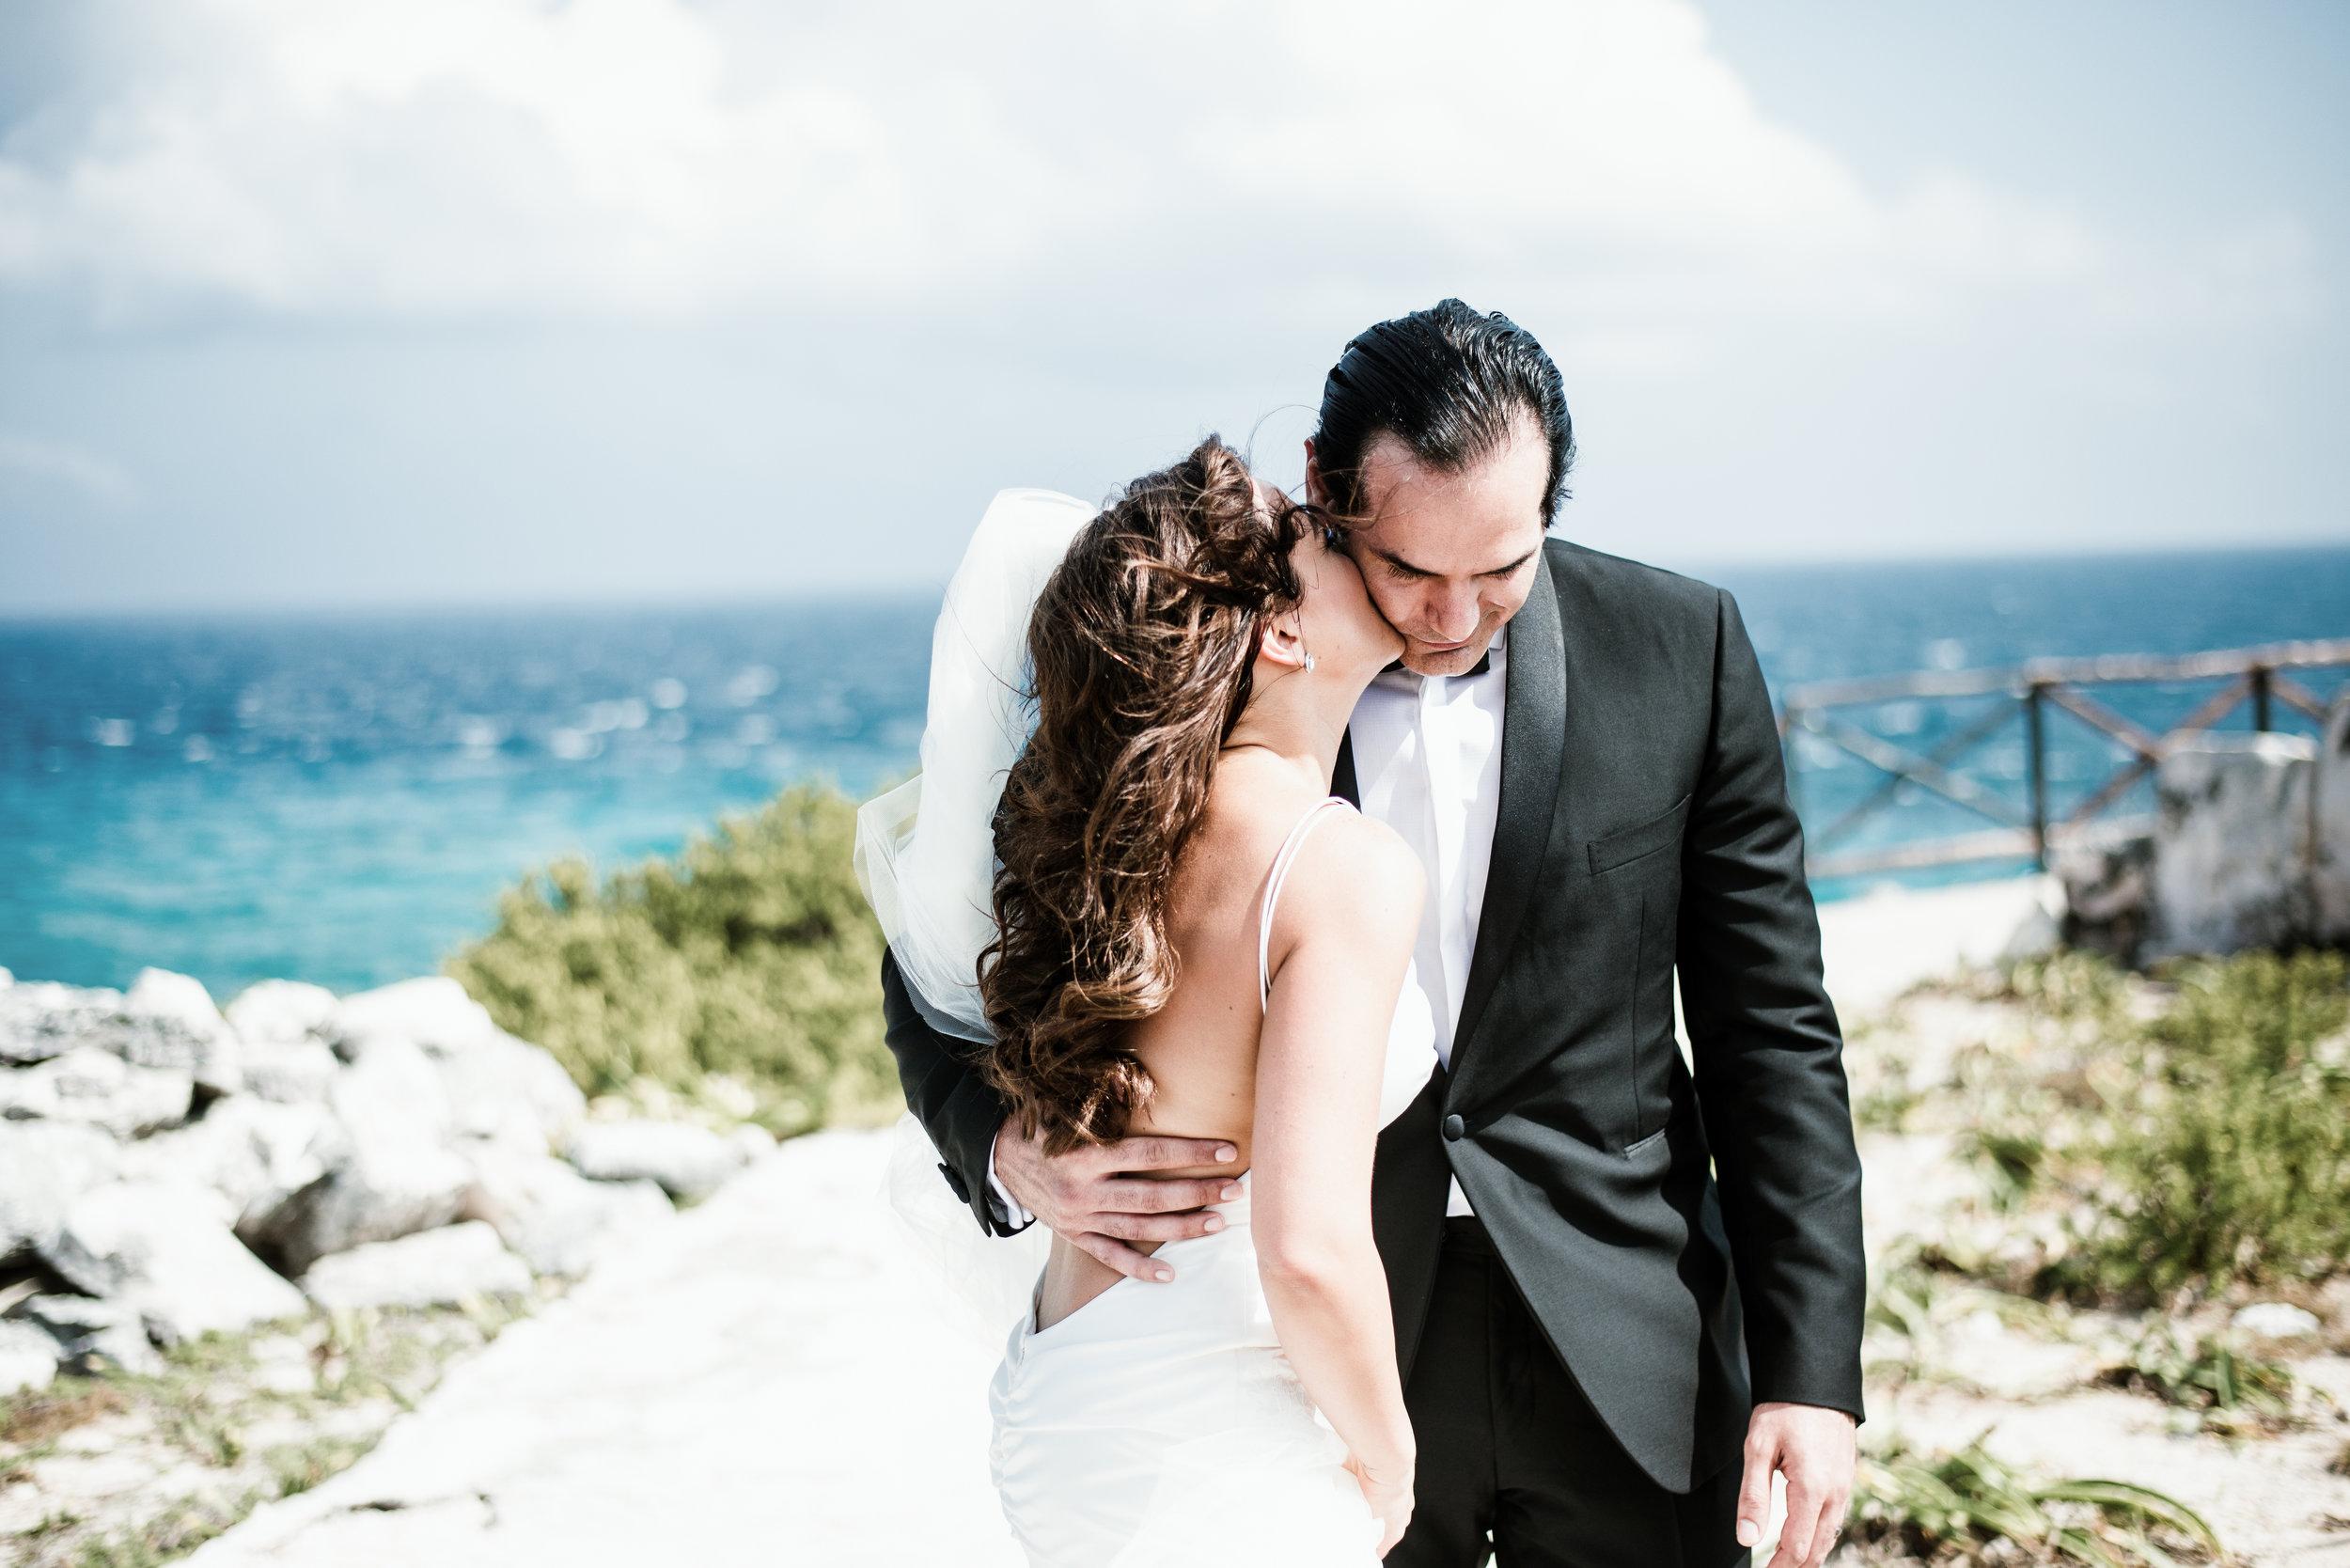 GISCARD + LOUISA - ISLA MUJERES MEXICO WEDDING